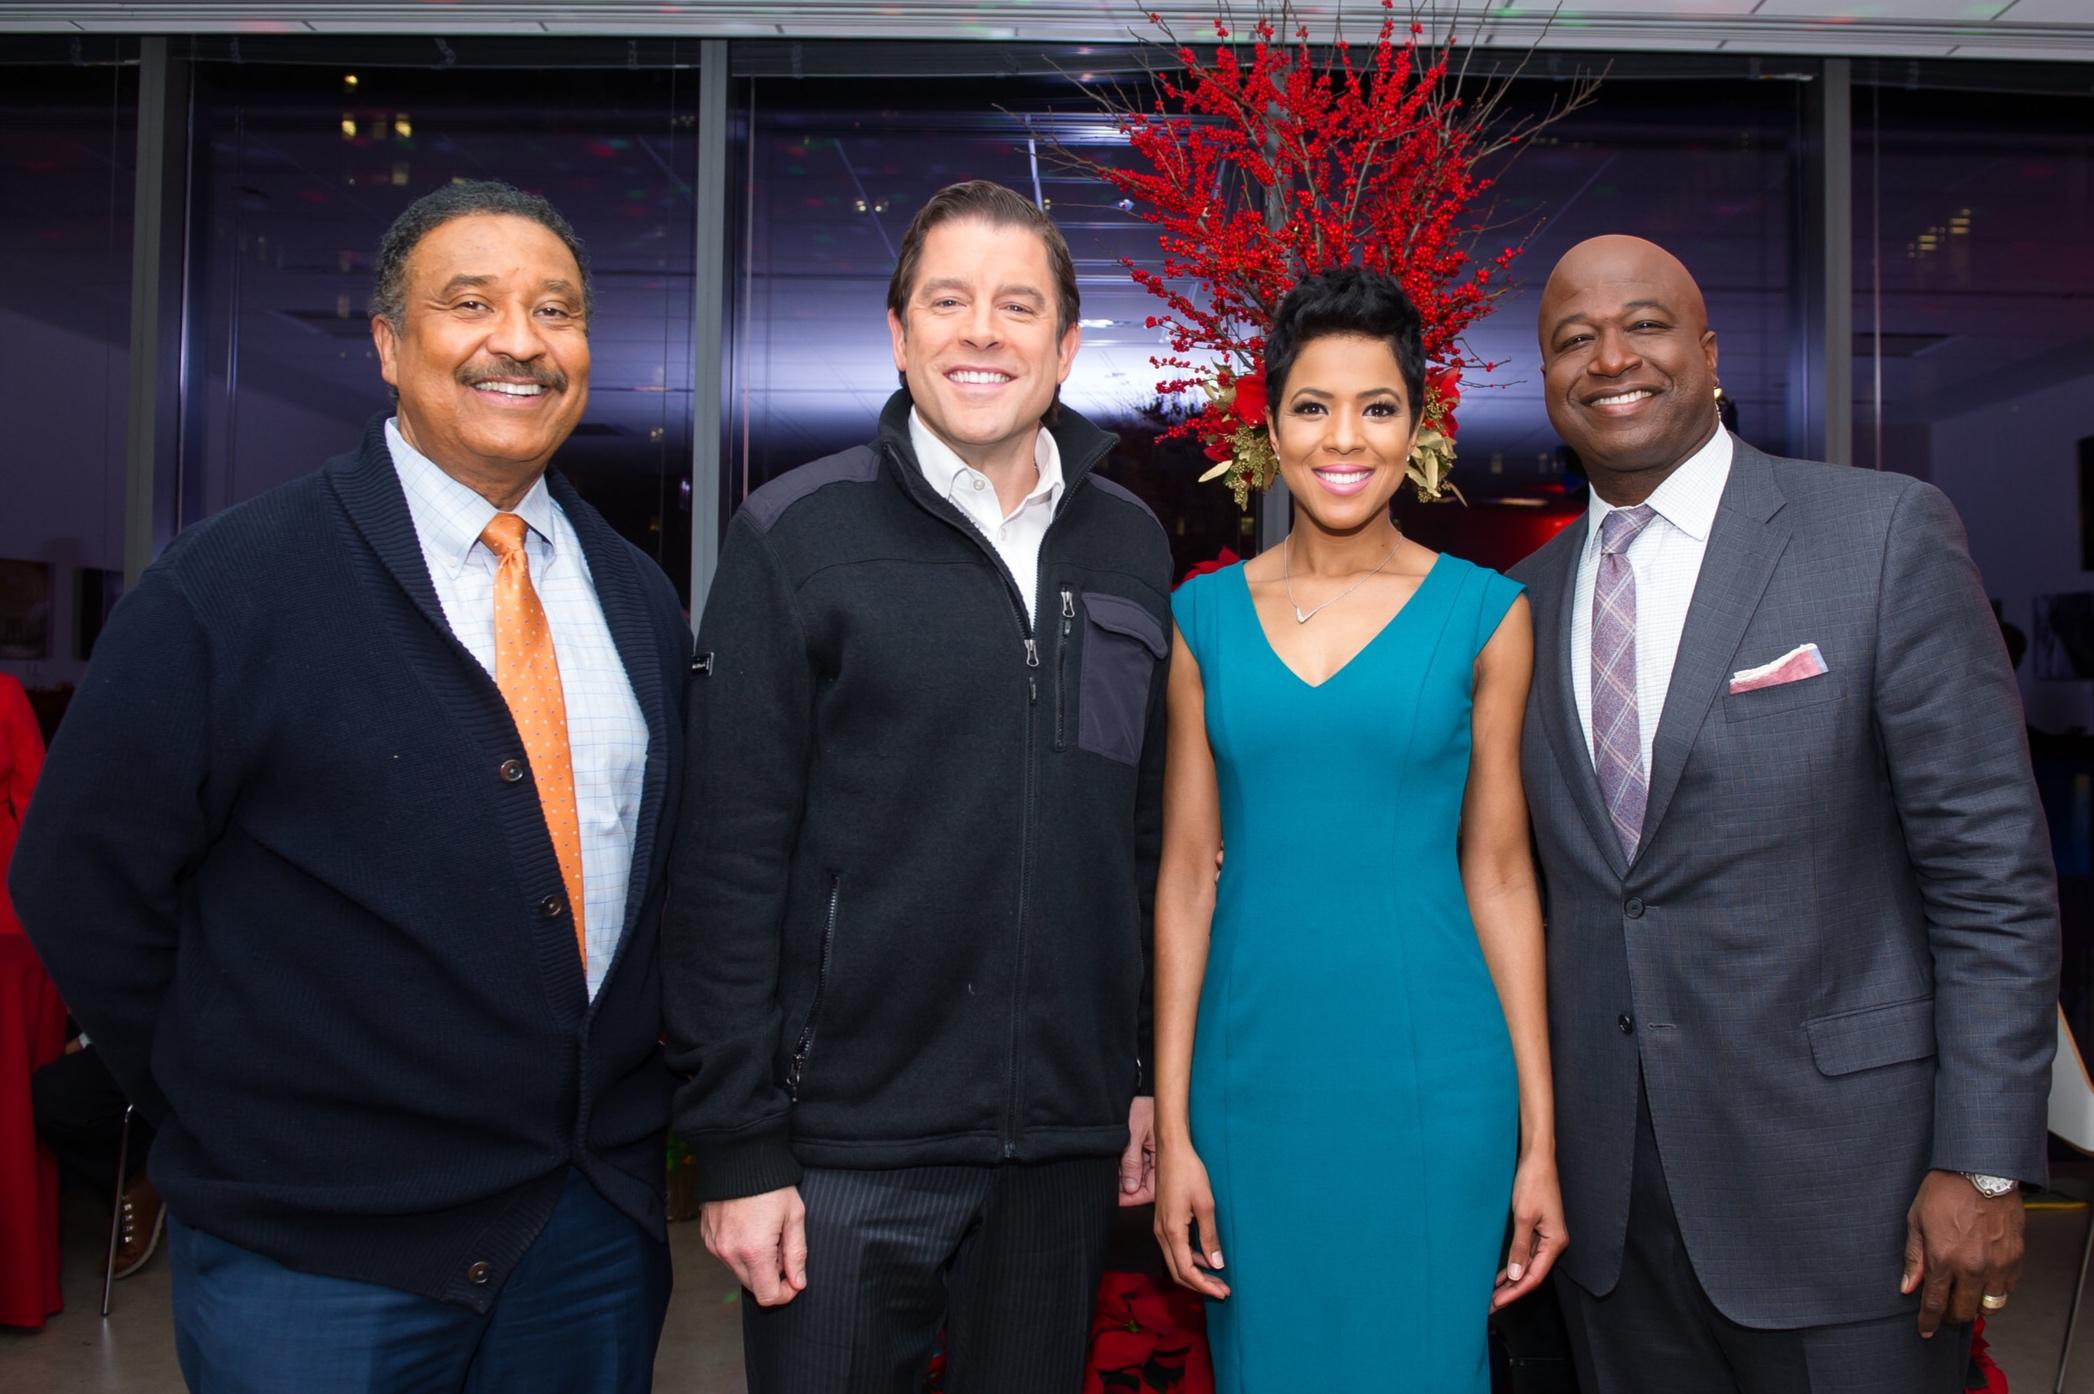 CBS News Anchors: Steve Baskerville, Rob Johnson, Irika Sargent, and Ryan Baker